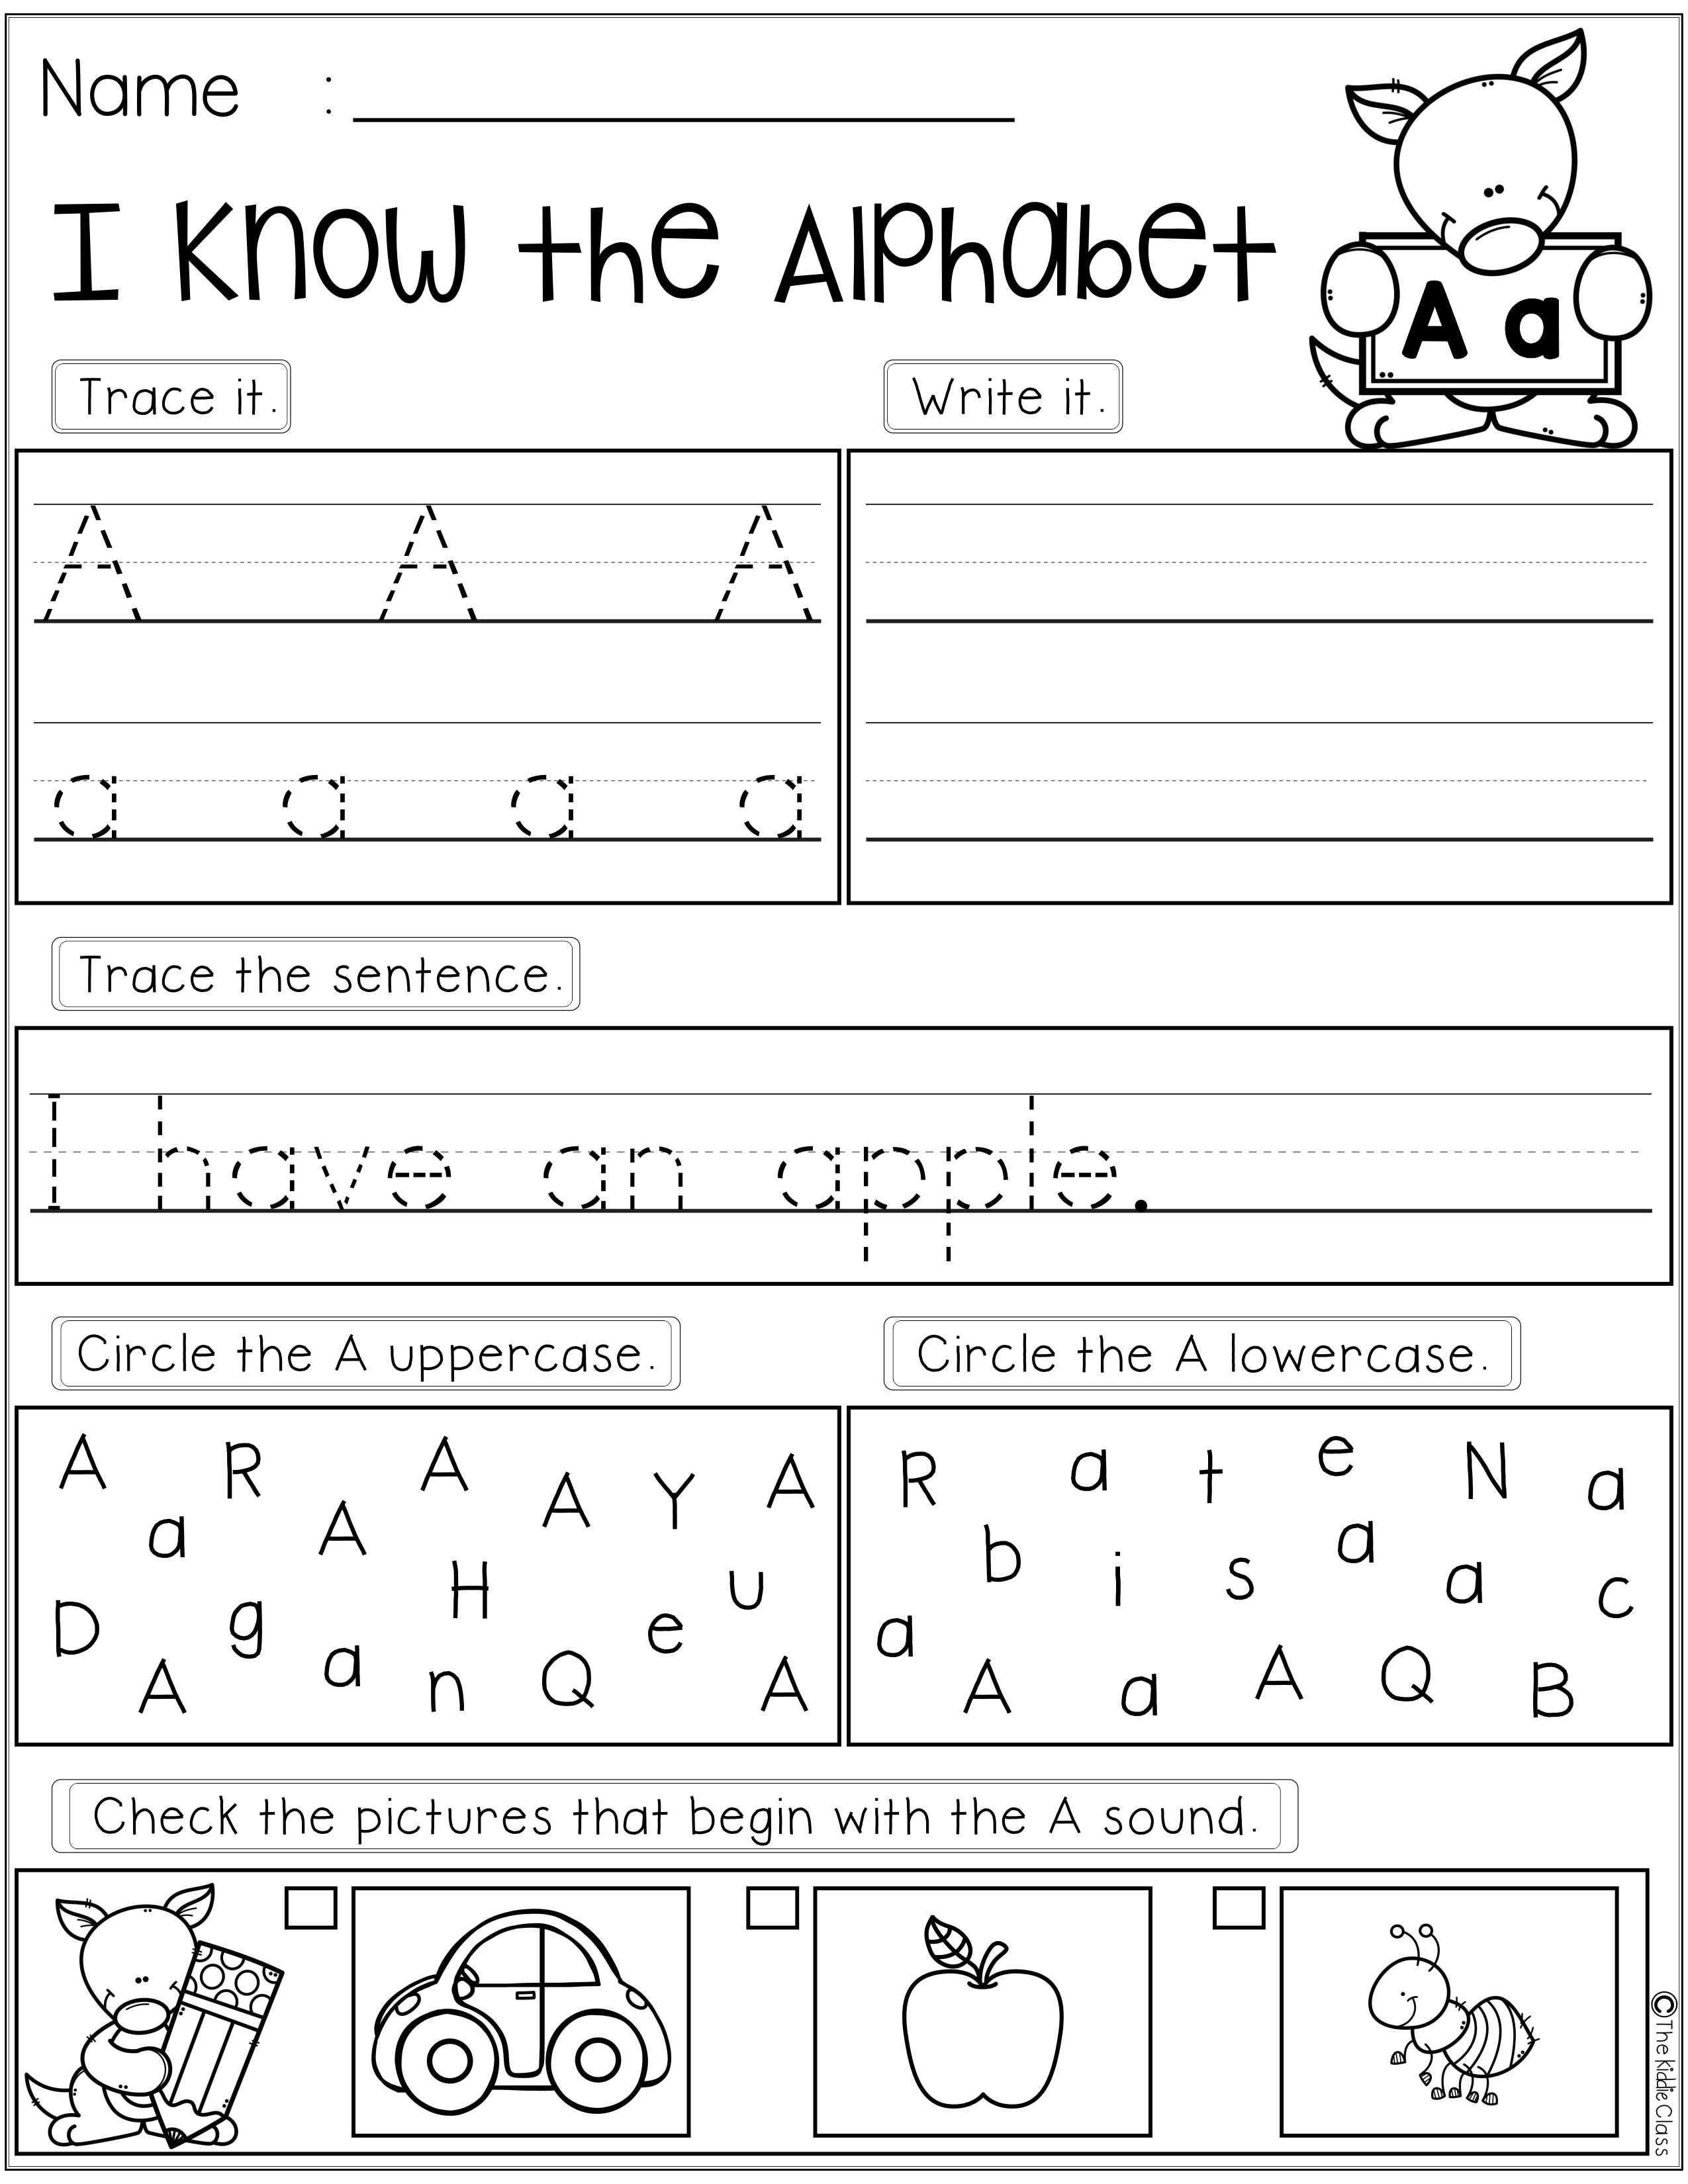 18 Alphabet Practice Printables Pismo Yazyk Anglijskij Yazyk [ 3300 x 2550 Pixel ]